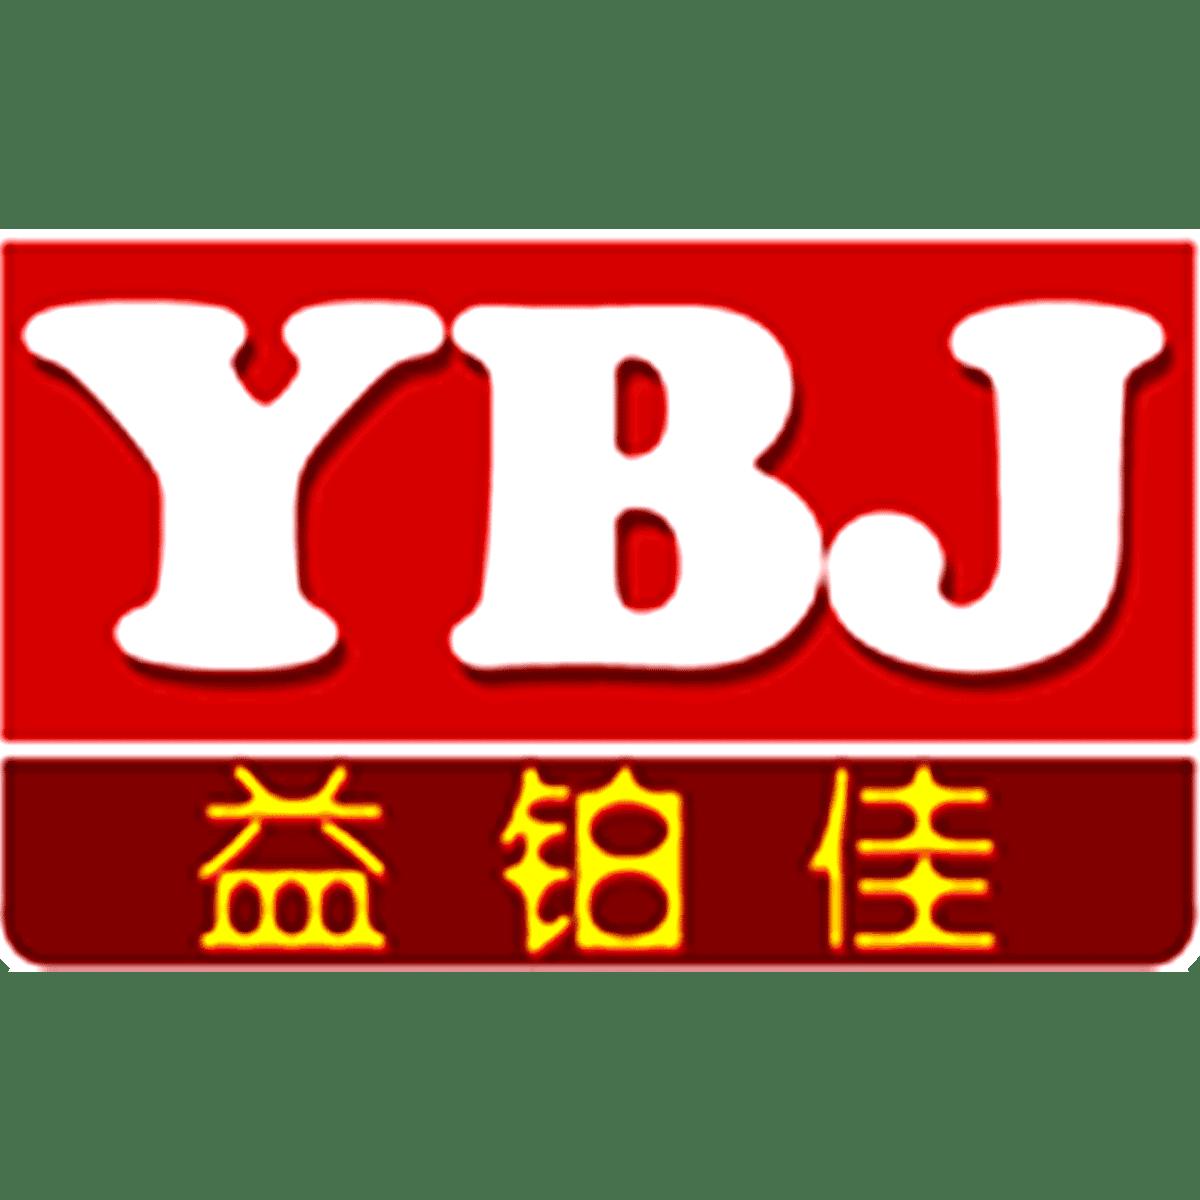 YBJ Book Printing